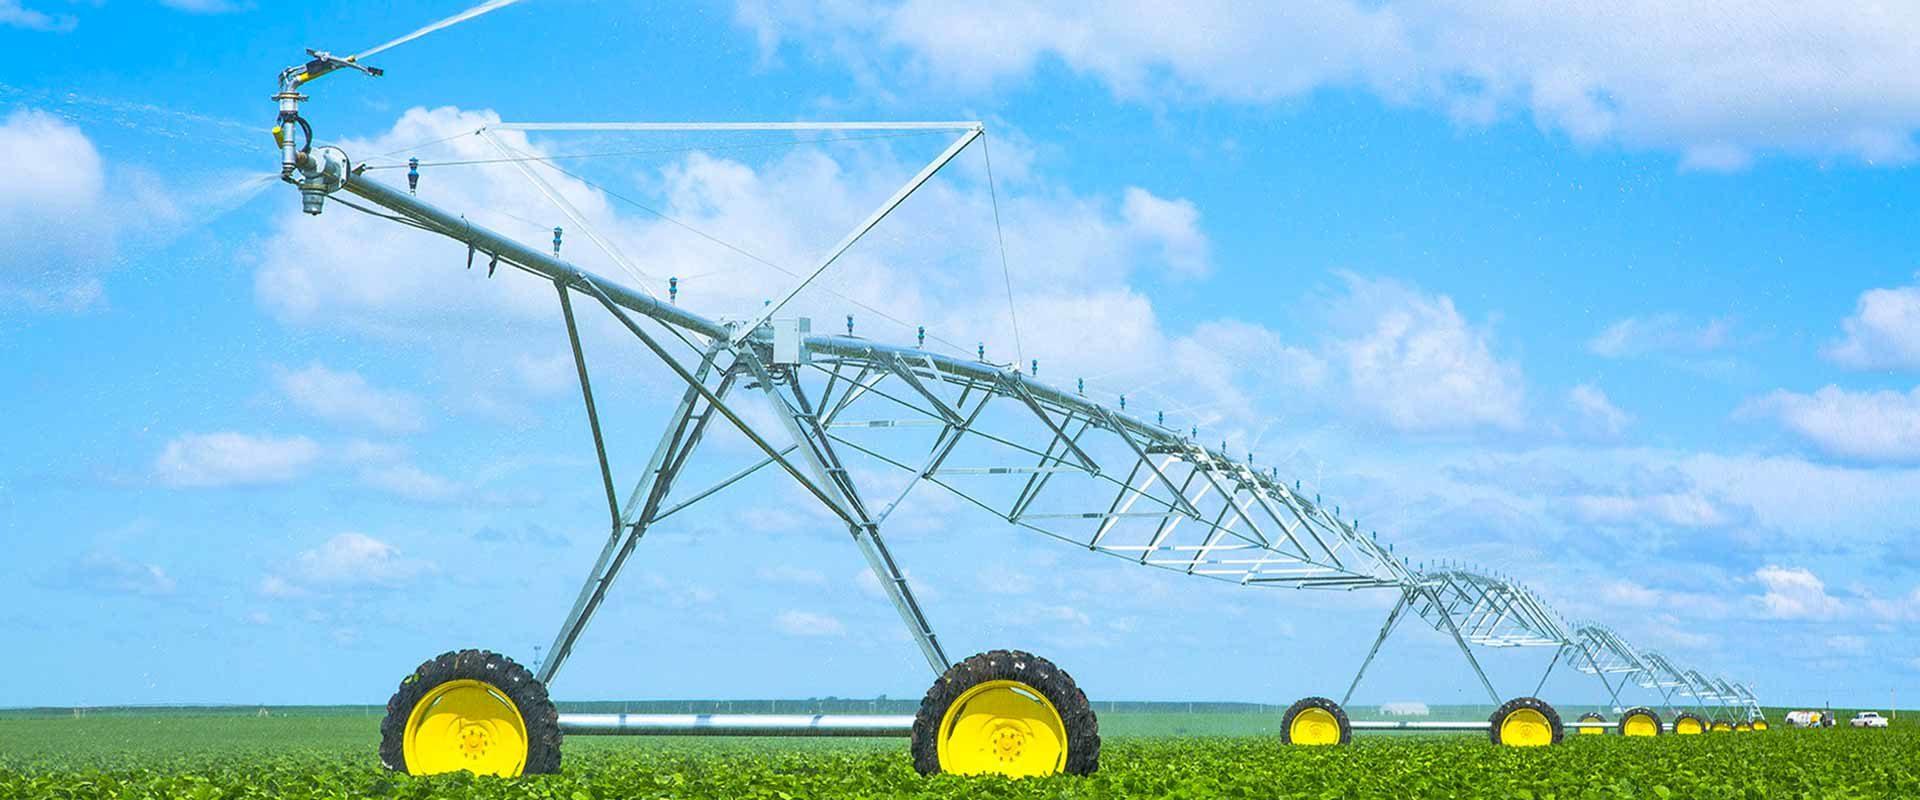 Eagle I Machinery - Products - T-L Irrigation